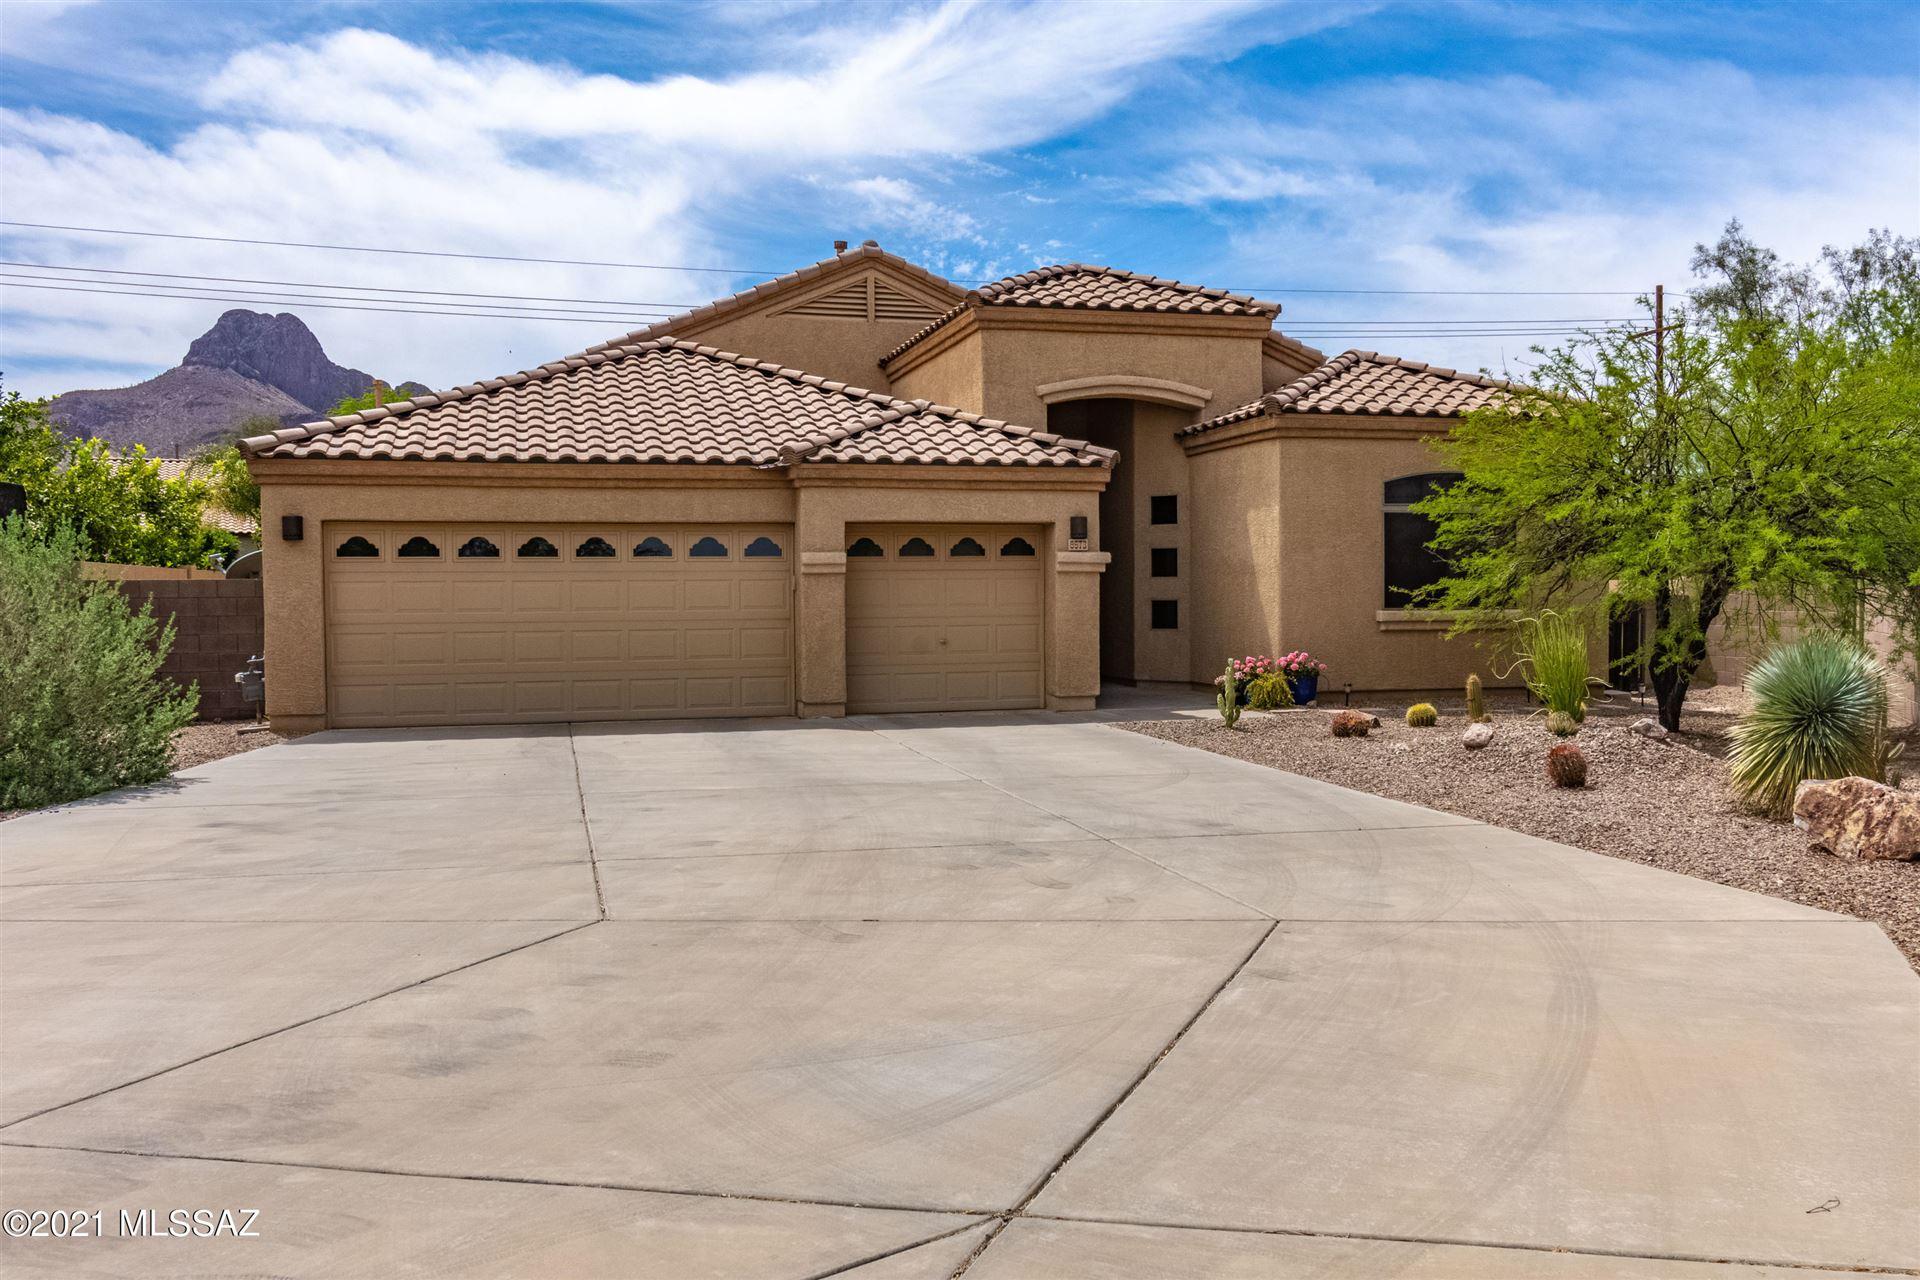 8573 N Sand Dune Place, Tucson, AZ 85743 - MLS#: 22109901